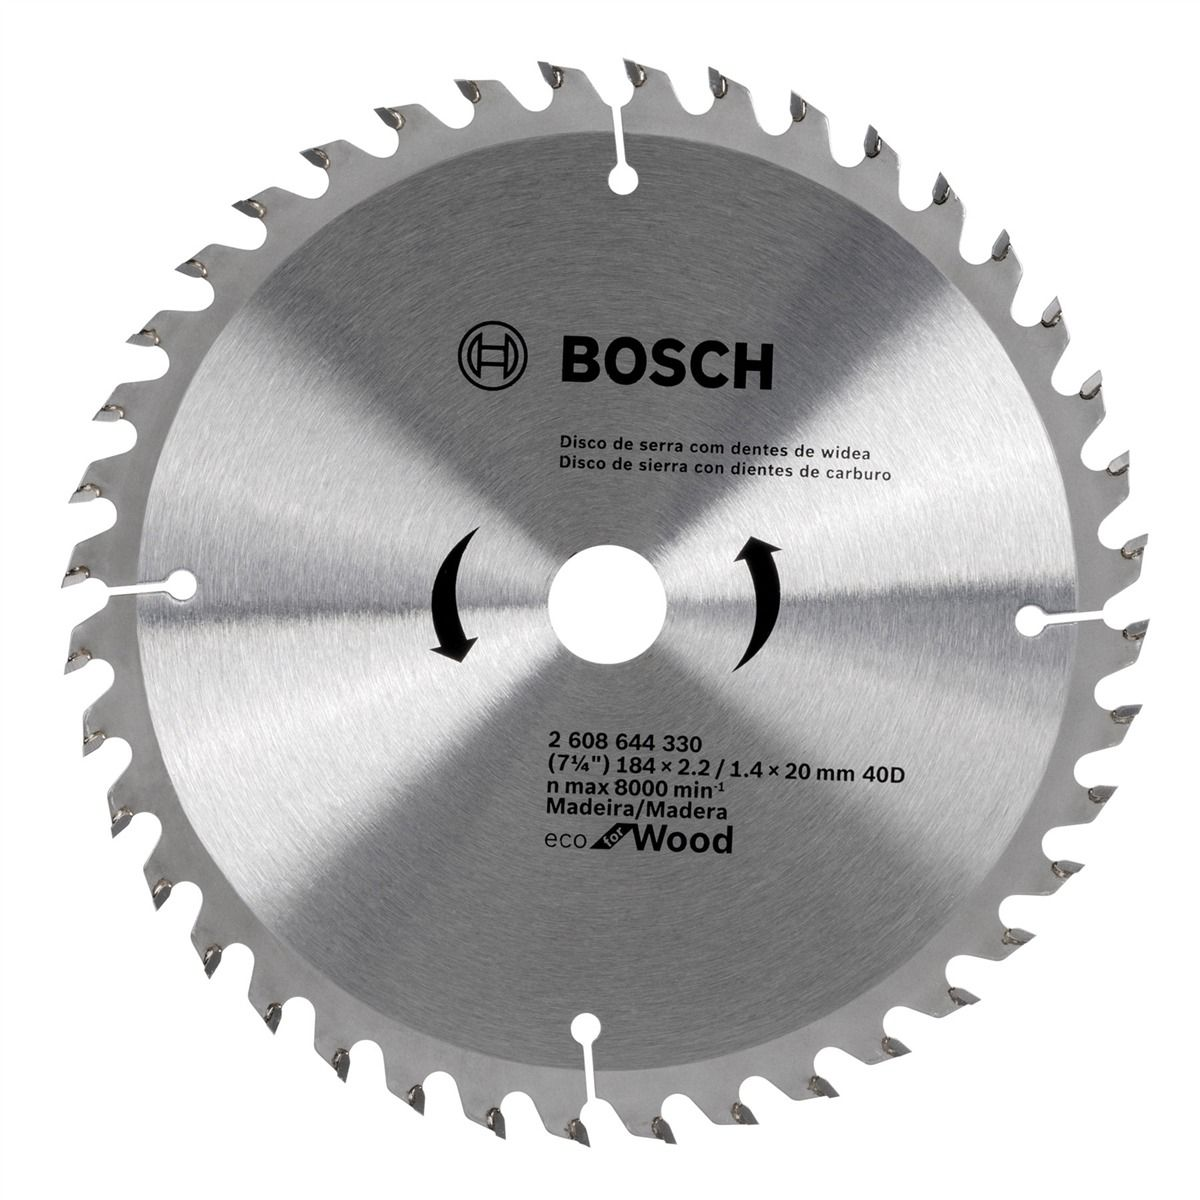 Disco de Serra circular Eco for Wood 184mm 40 Dentes 2608644330 Bosch